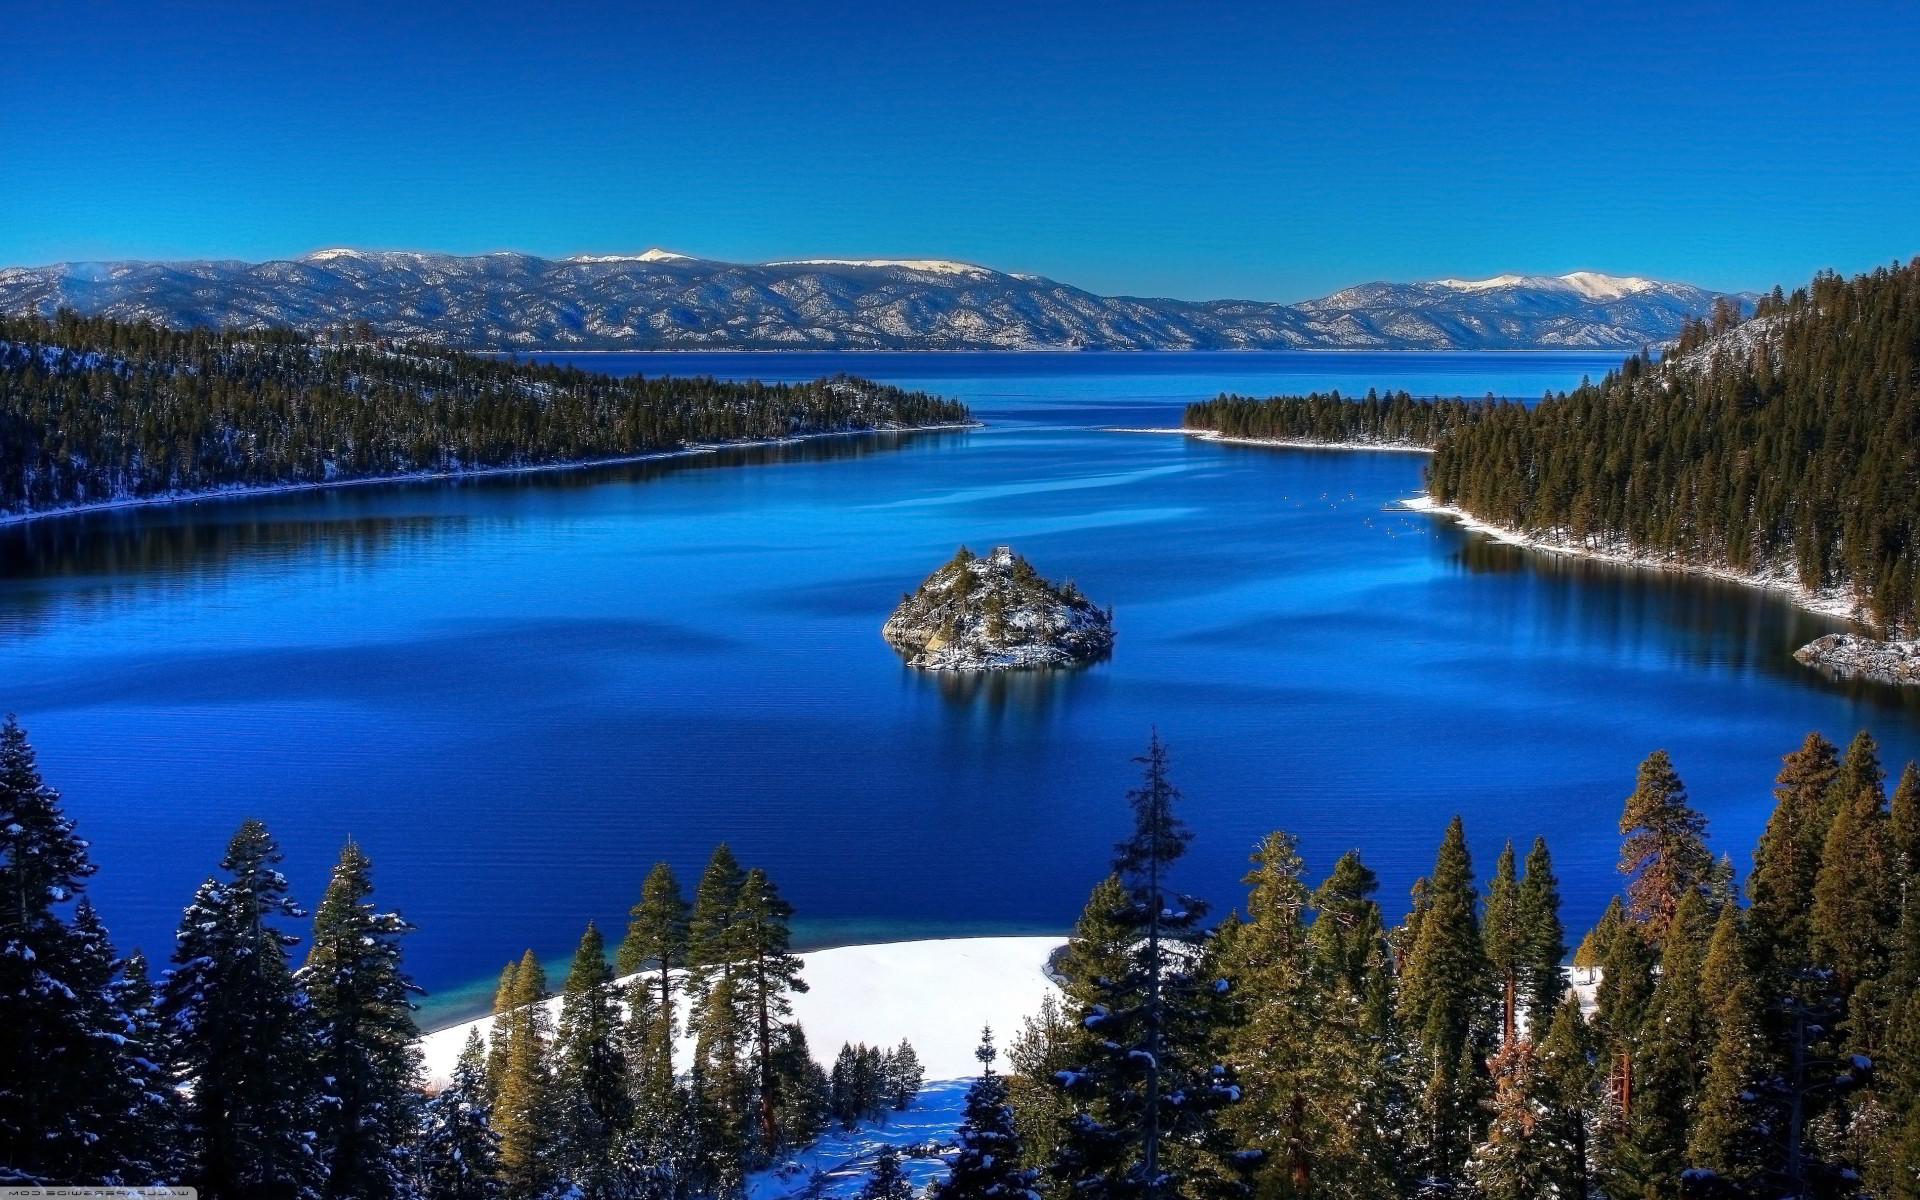 Lake Tahoe Wallpaper Emerald Bay 61 Images